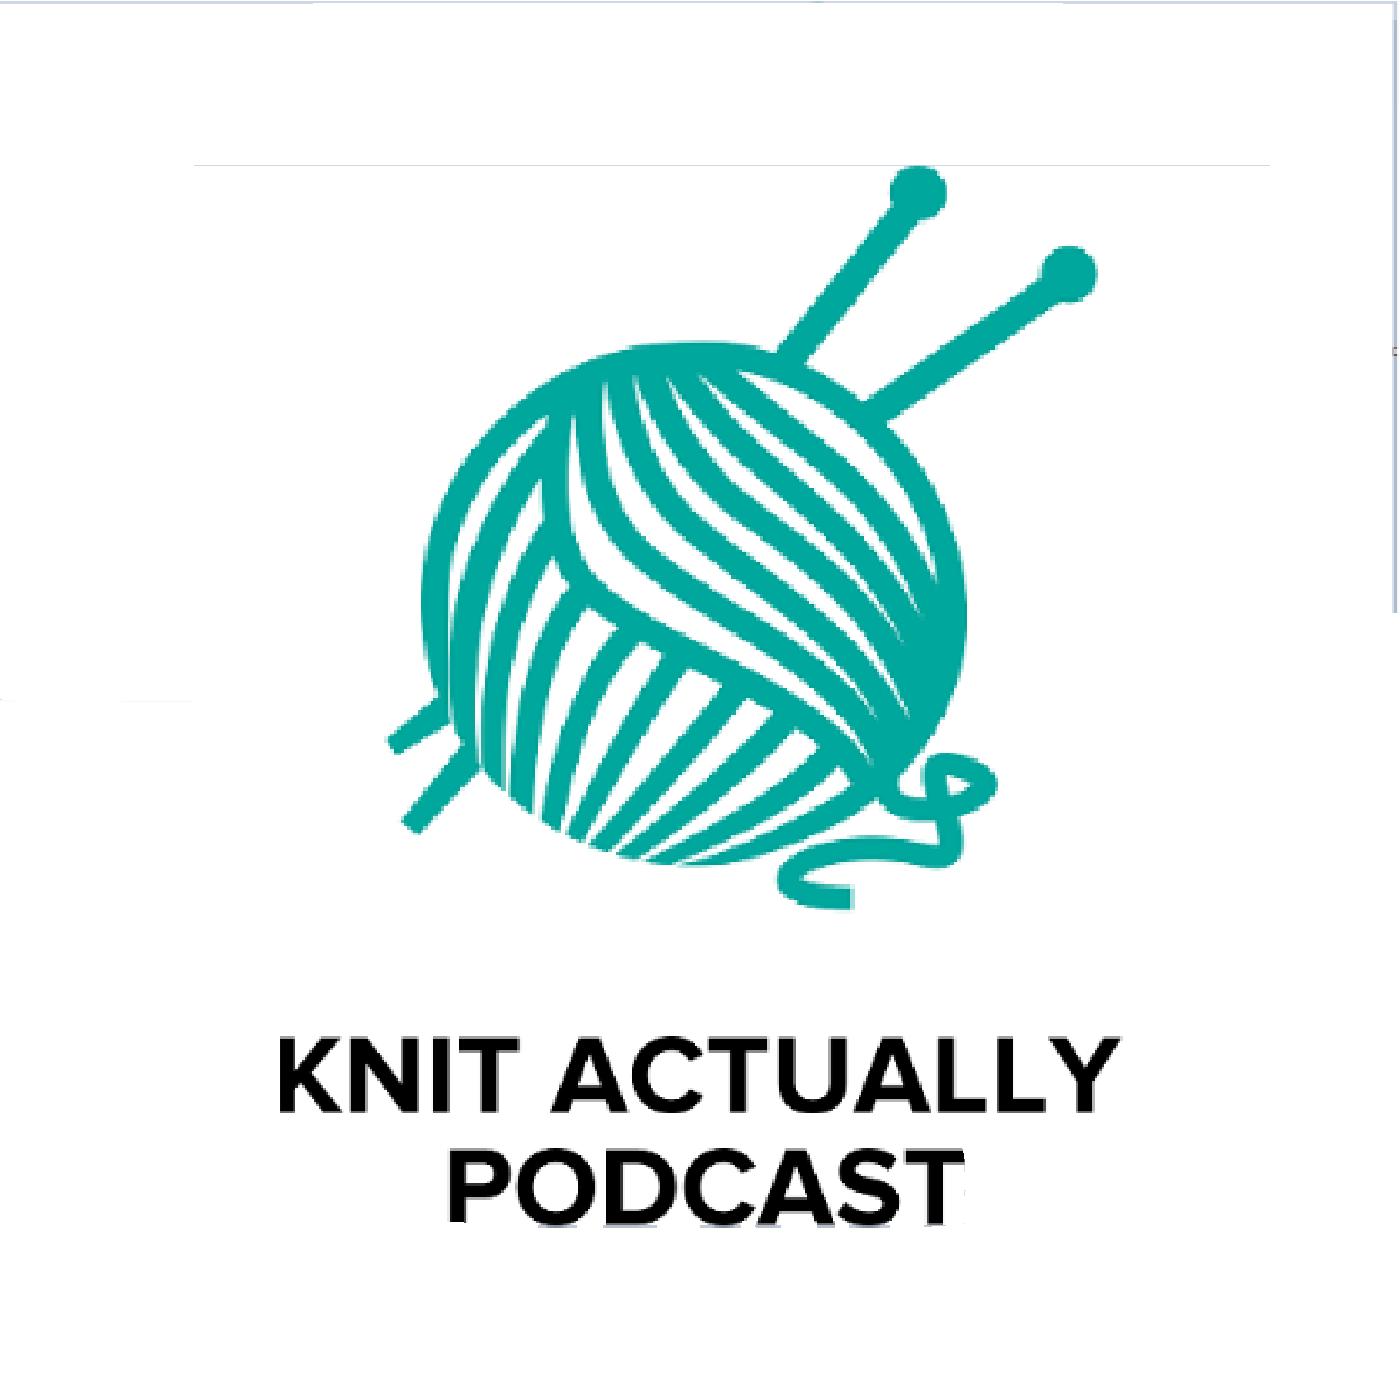 Knit Actually Podcast - Knit Actually Podcast